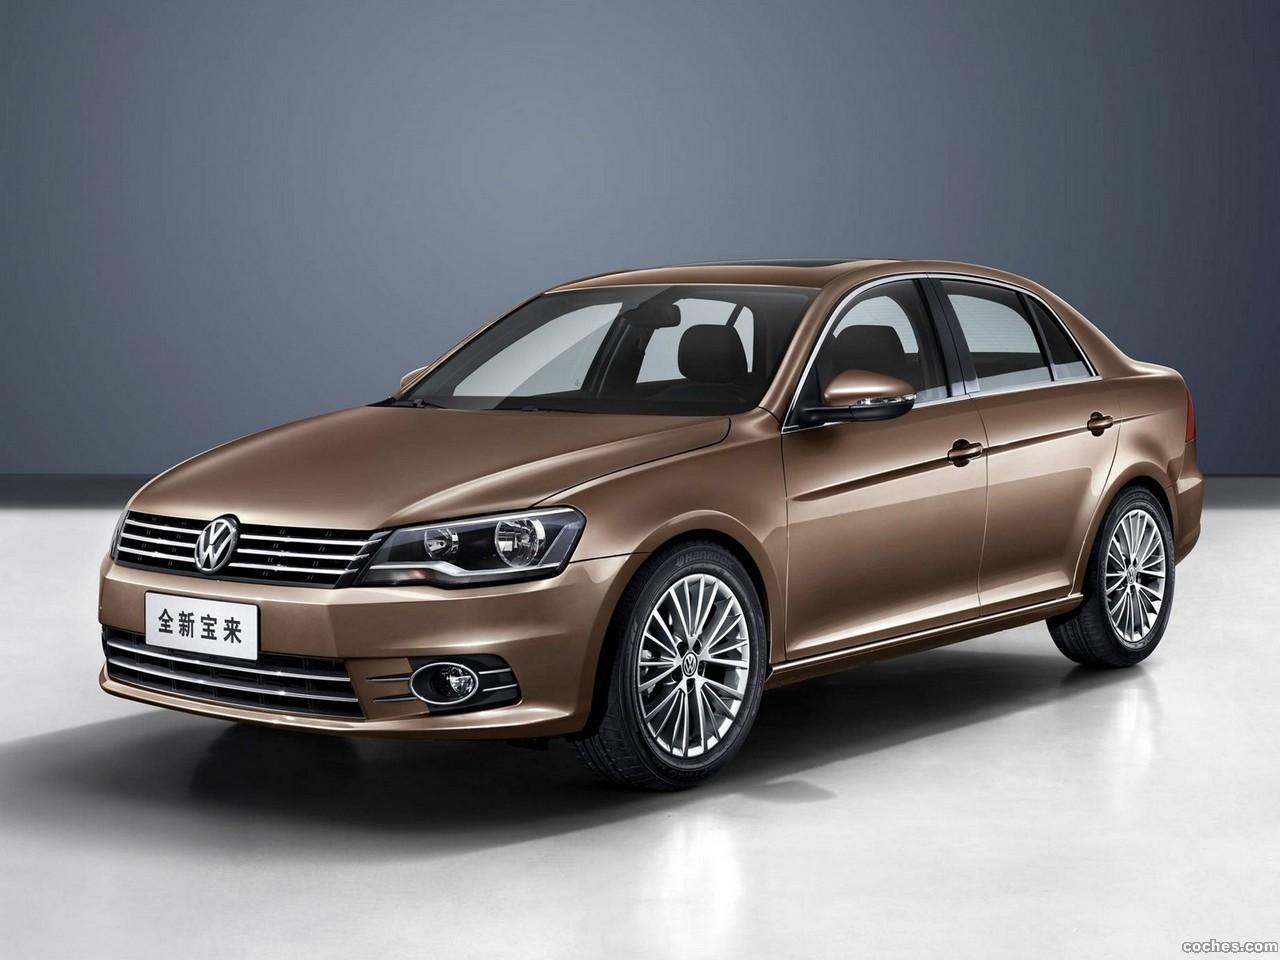 Foto 0 de Volkswagen Bora China 2012